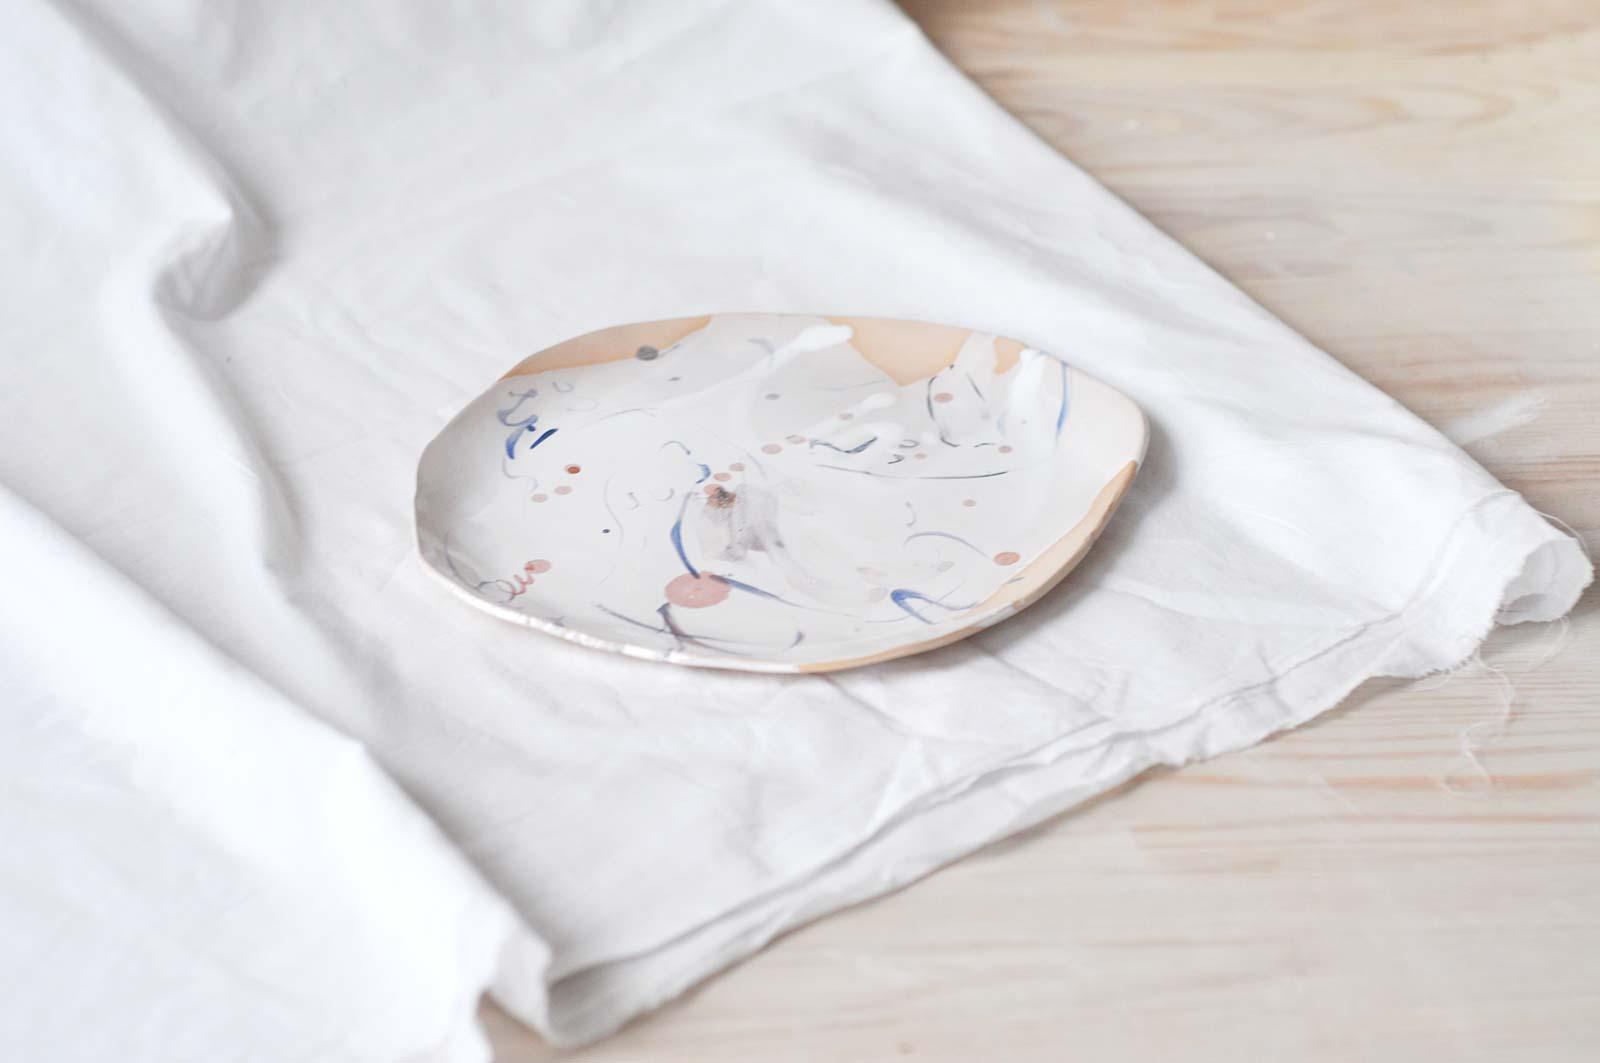 Декоративная тарелка (Ручная работа)